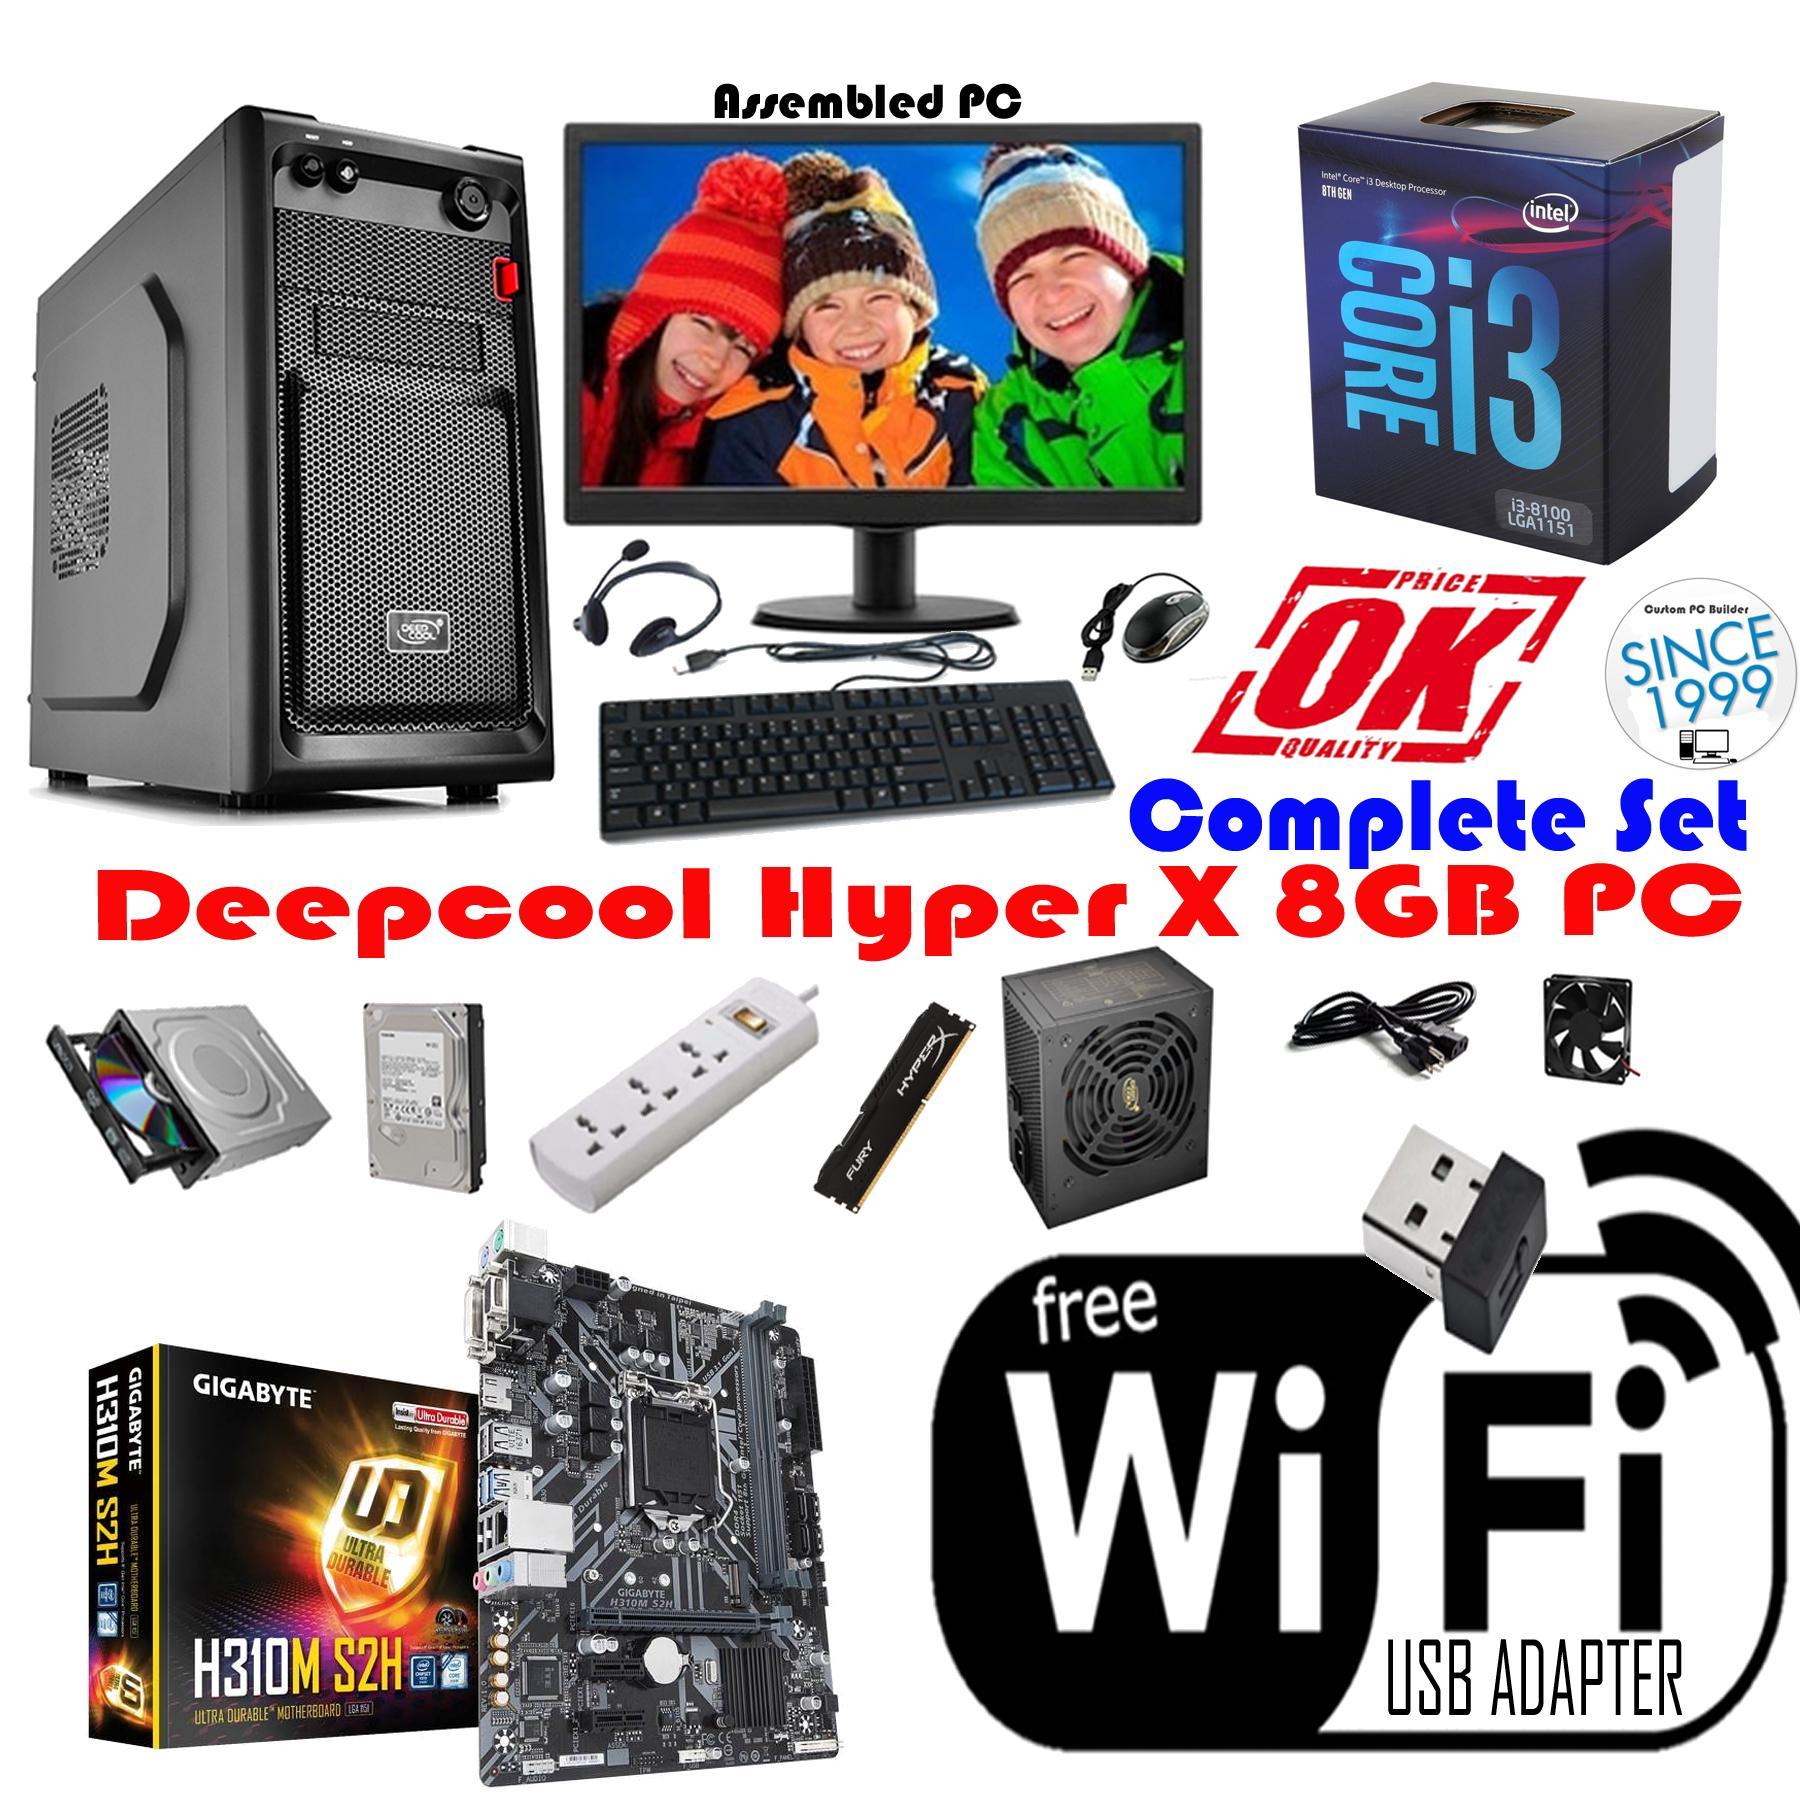 Hyperx Deepcool 8gb Pc Intel Core I3 8100 Coffee Lake Quad 36 Pentium G4600 36ghz Kabylake Socket 1151 Ghz Lga